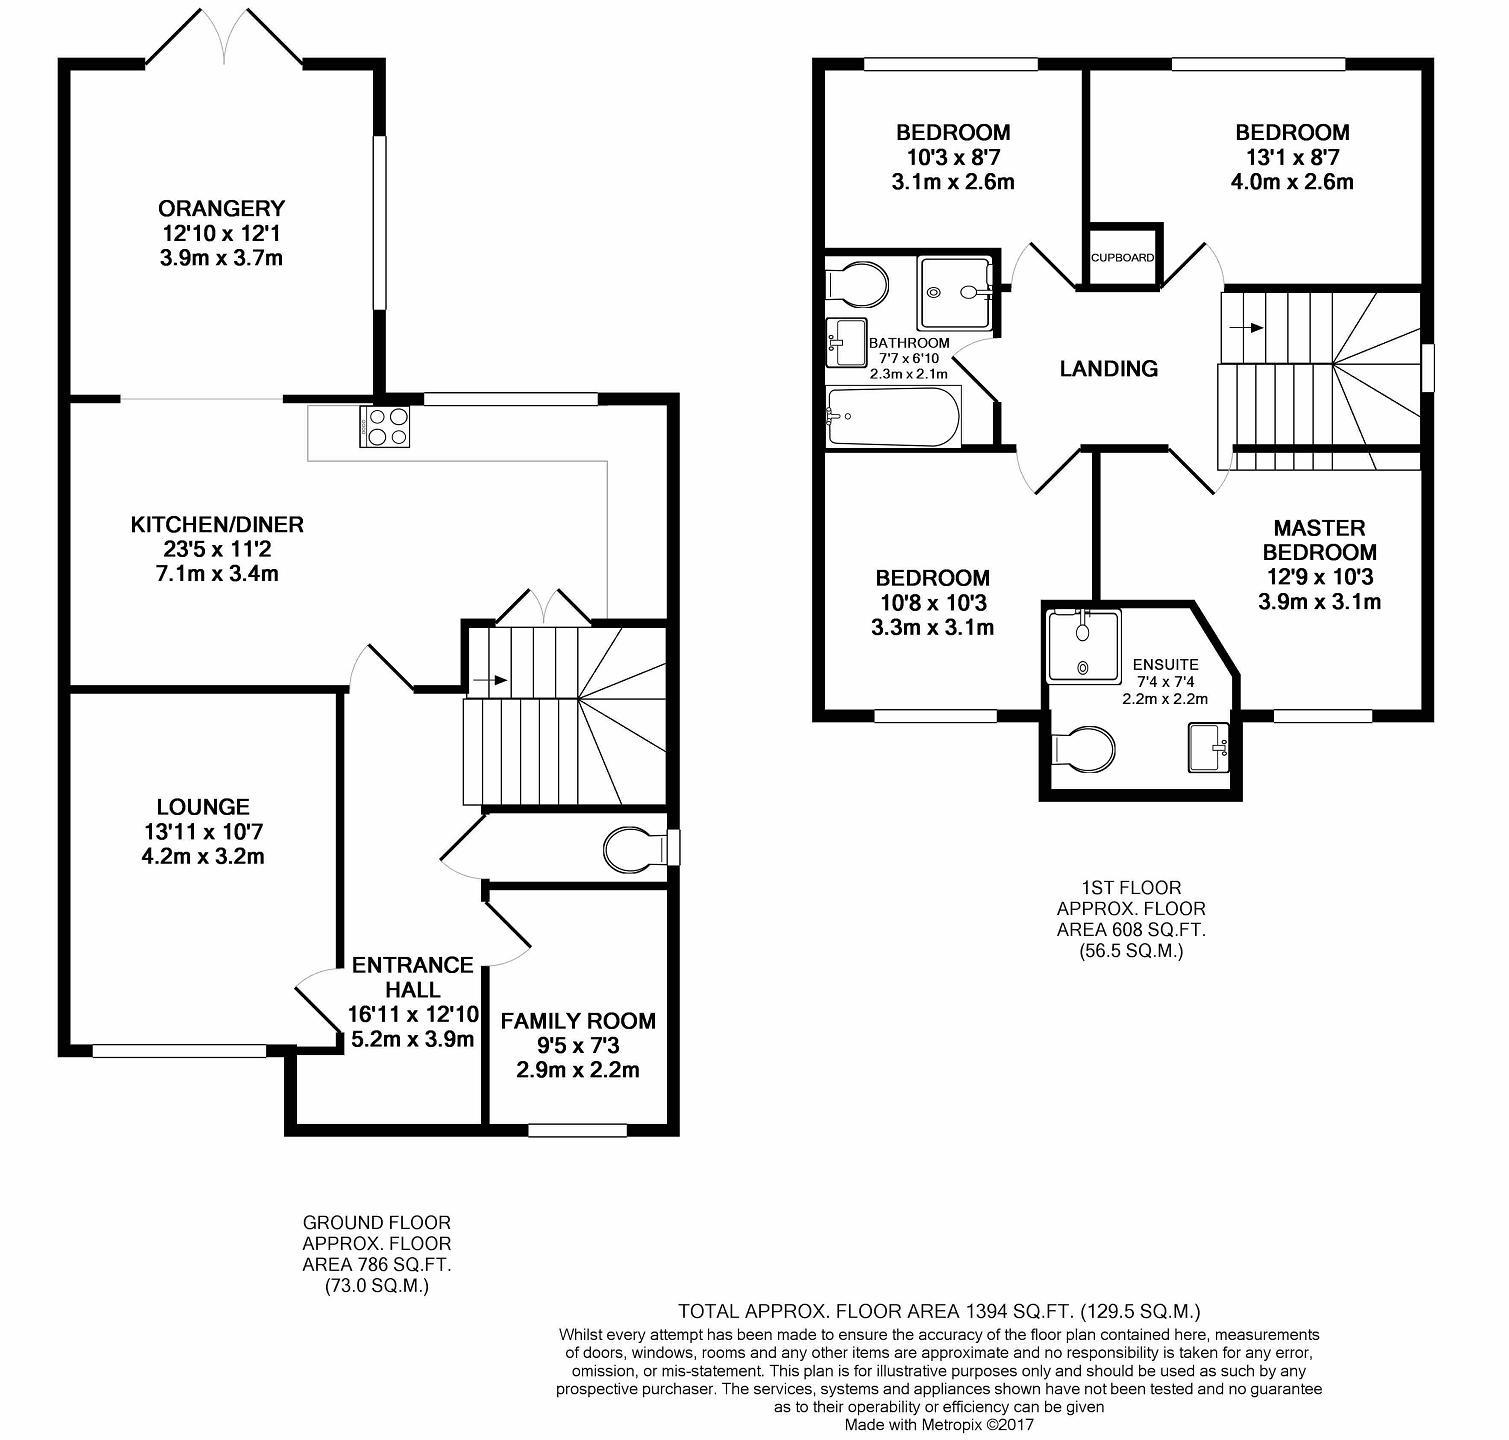 Kitchen Design Layout 10 X 11 Charming Home